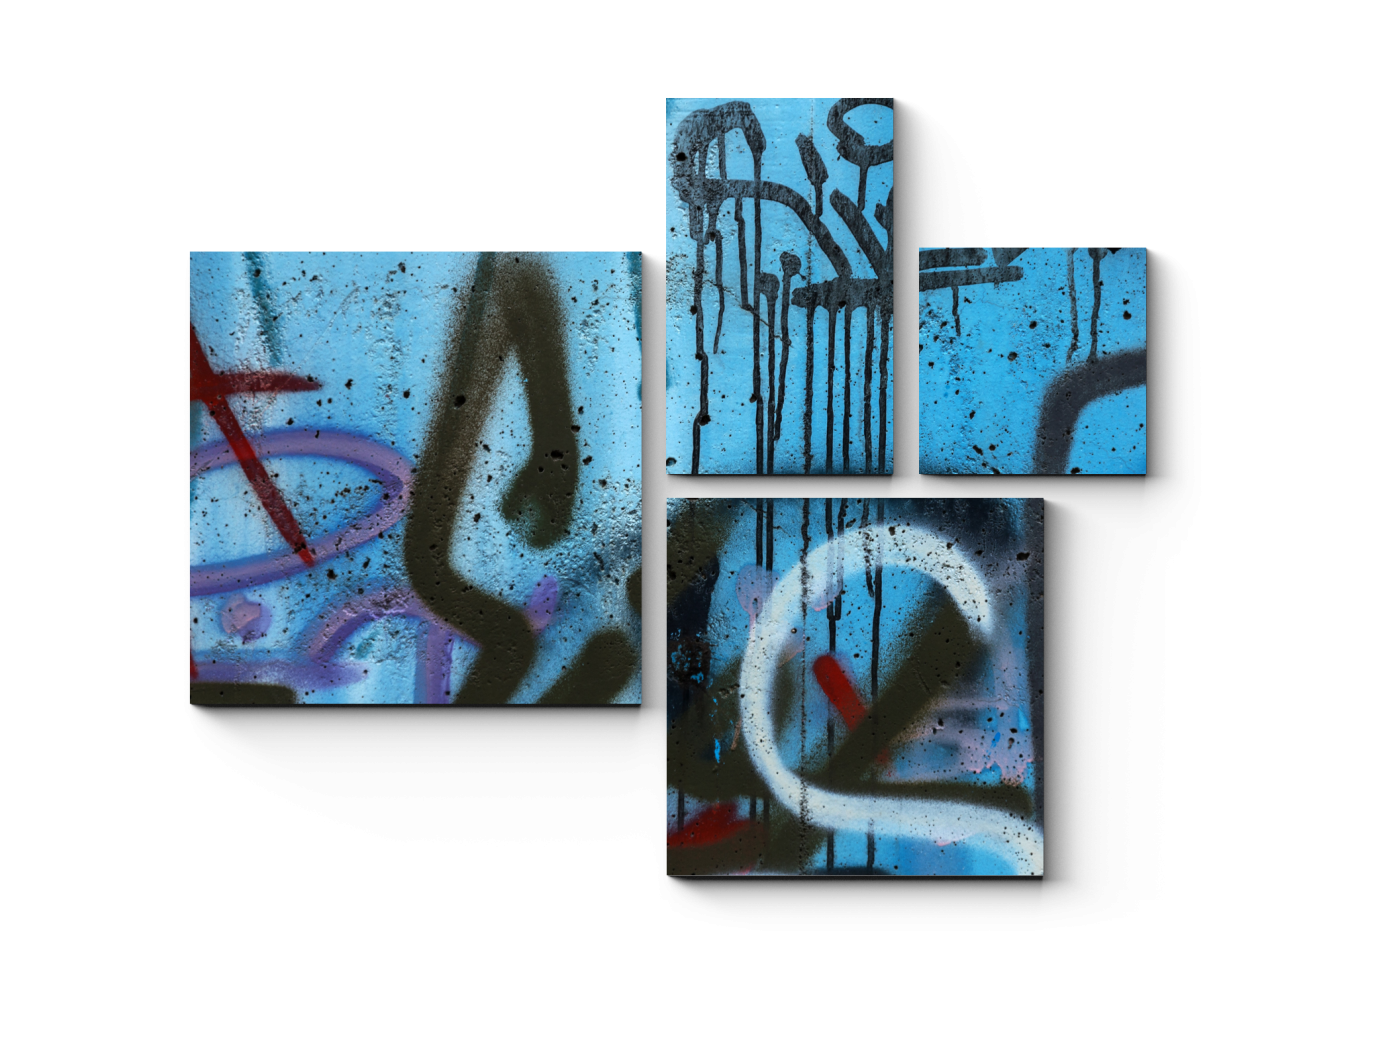 Модульная картина Искусство граффити (72x60) фото